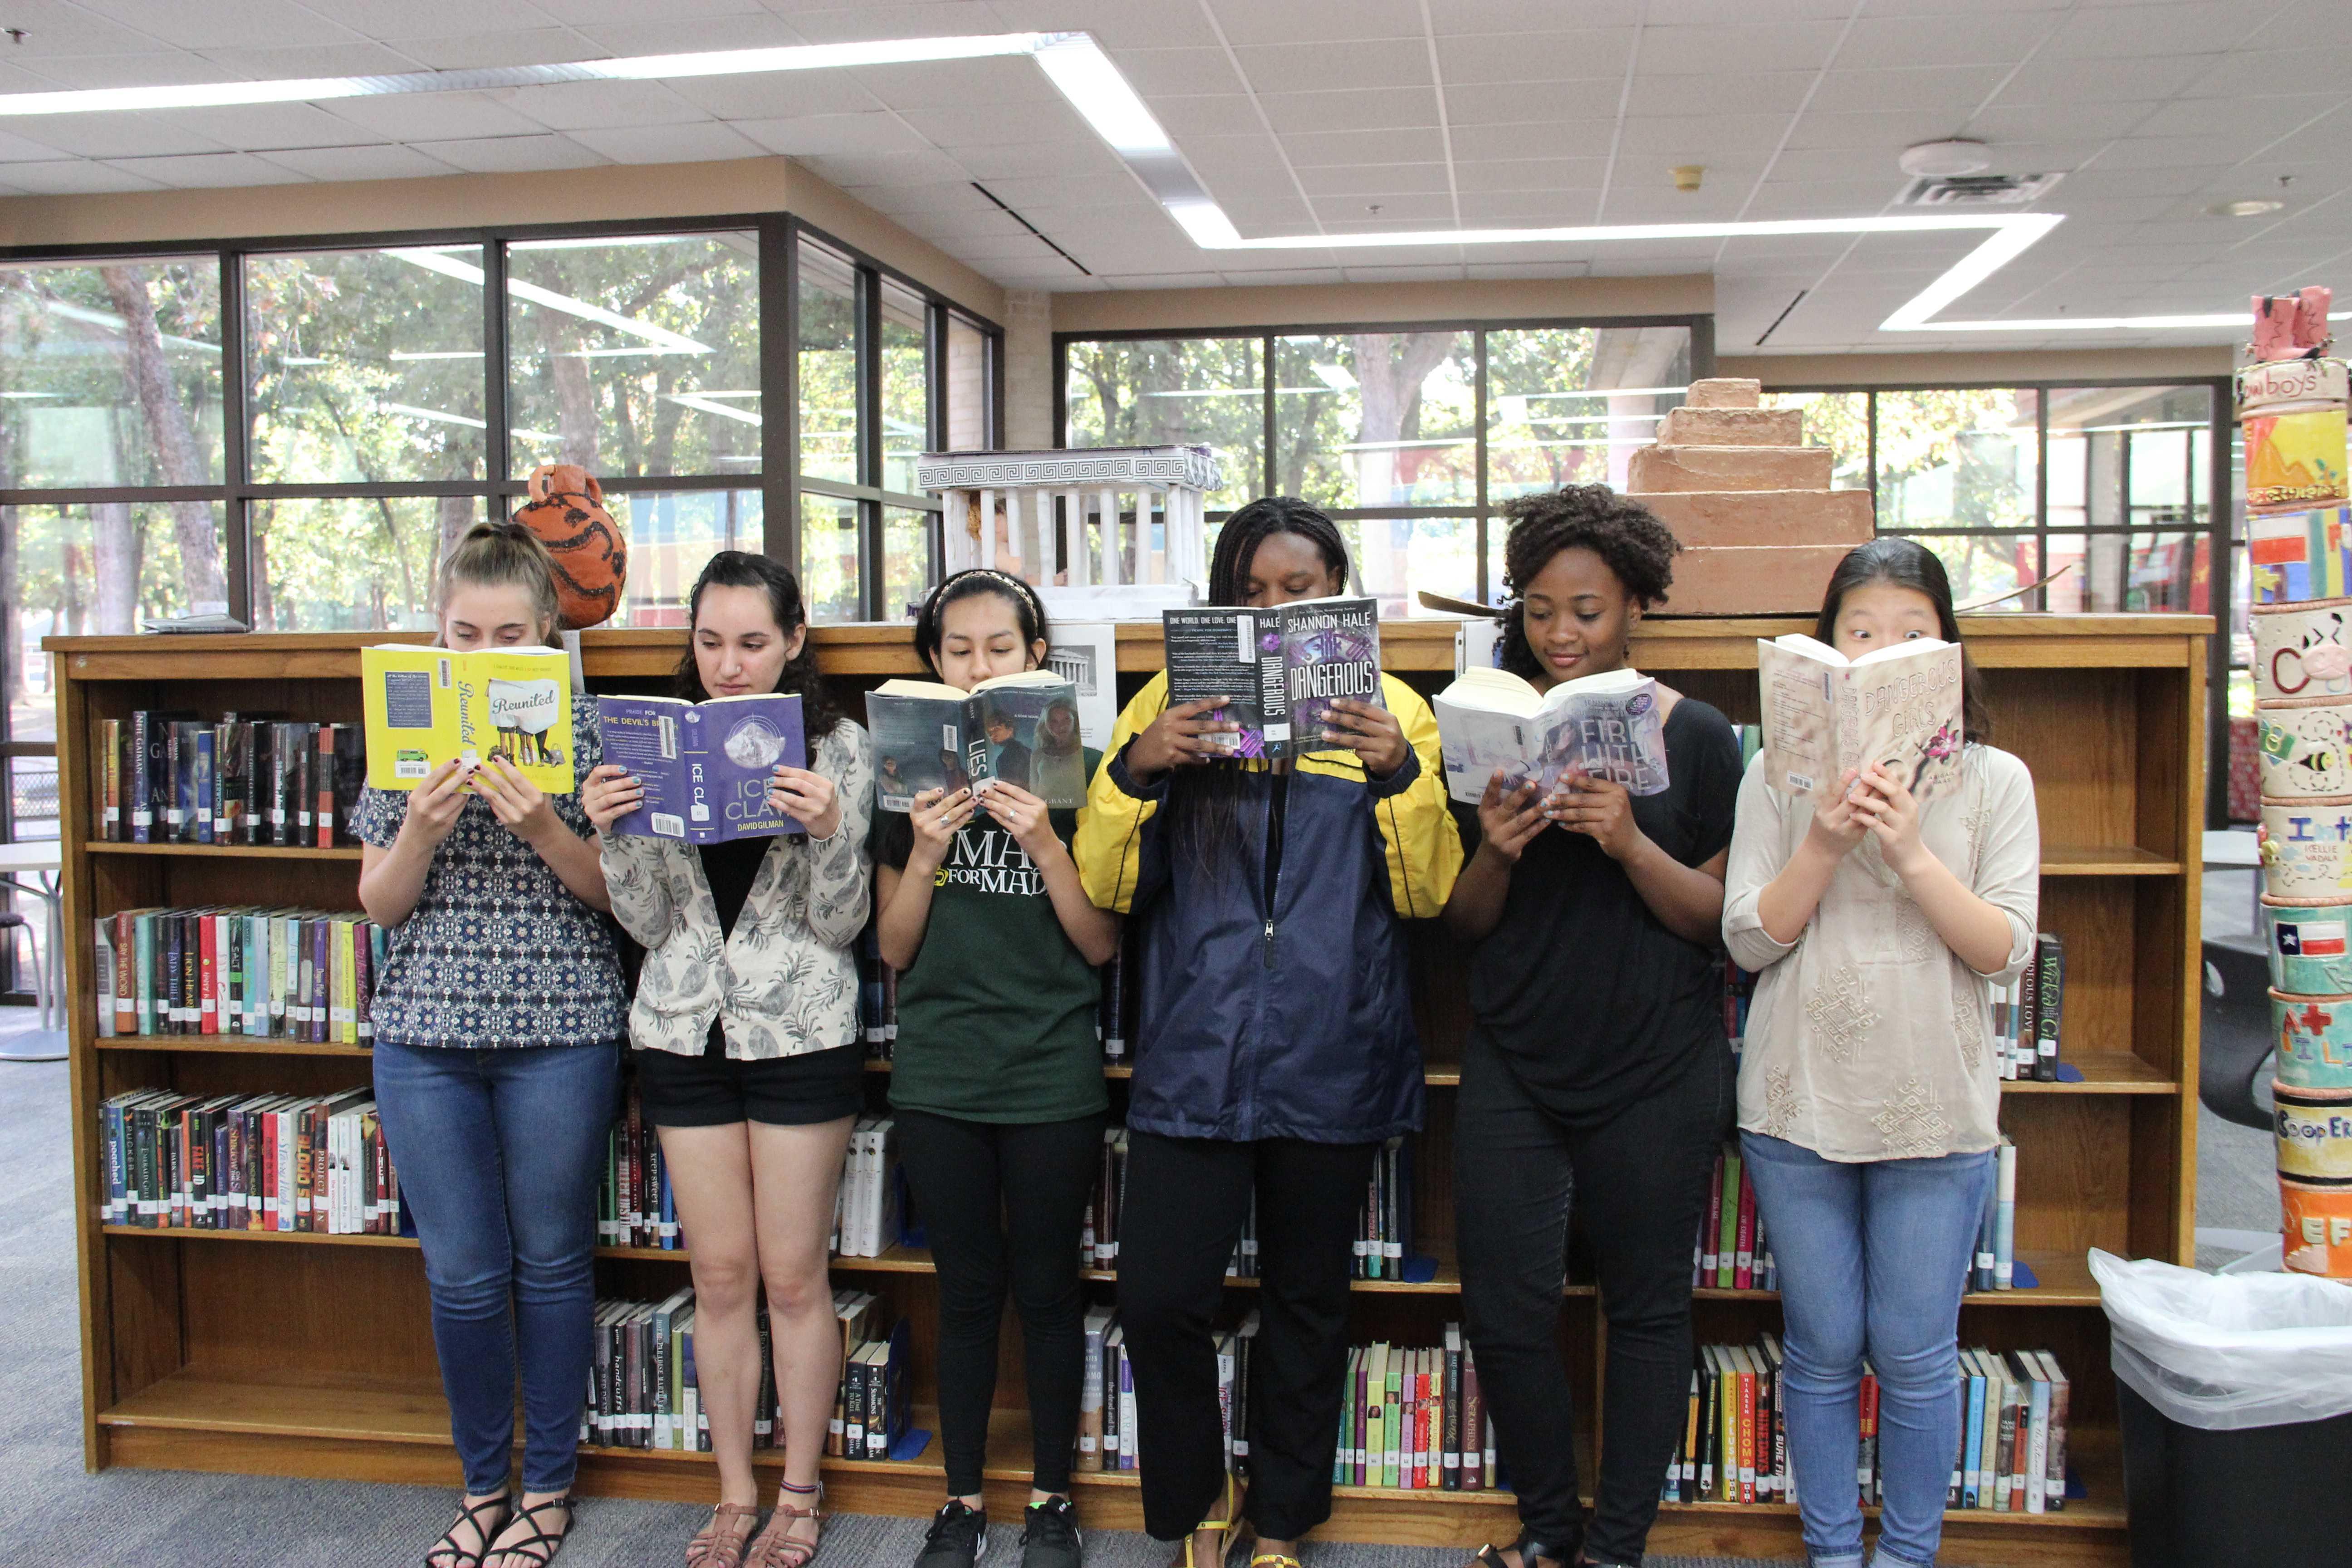 Coppell High School seniors Leia Emerson, Iliana Diaz, Imelda Rivera, Lexi Muraga, Hauwa Oyebanji and junior Miley Shin enjoy the classics, as well as other modern novels.